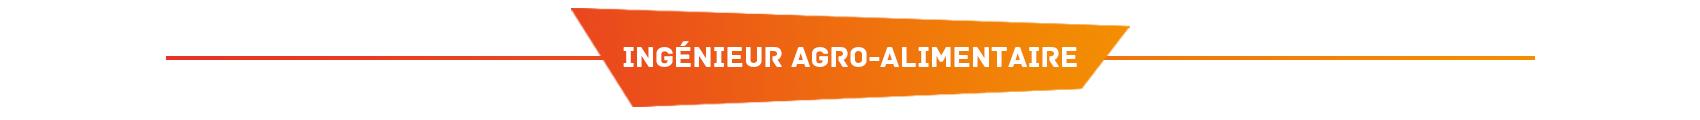 Ingénieur AgroSup